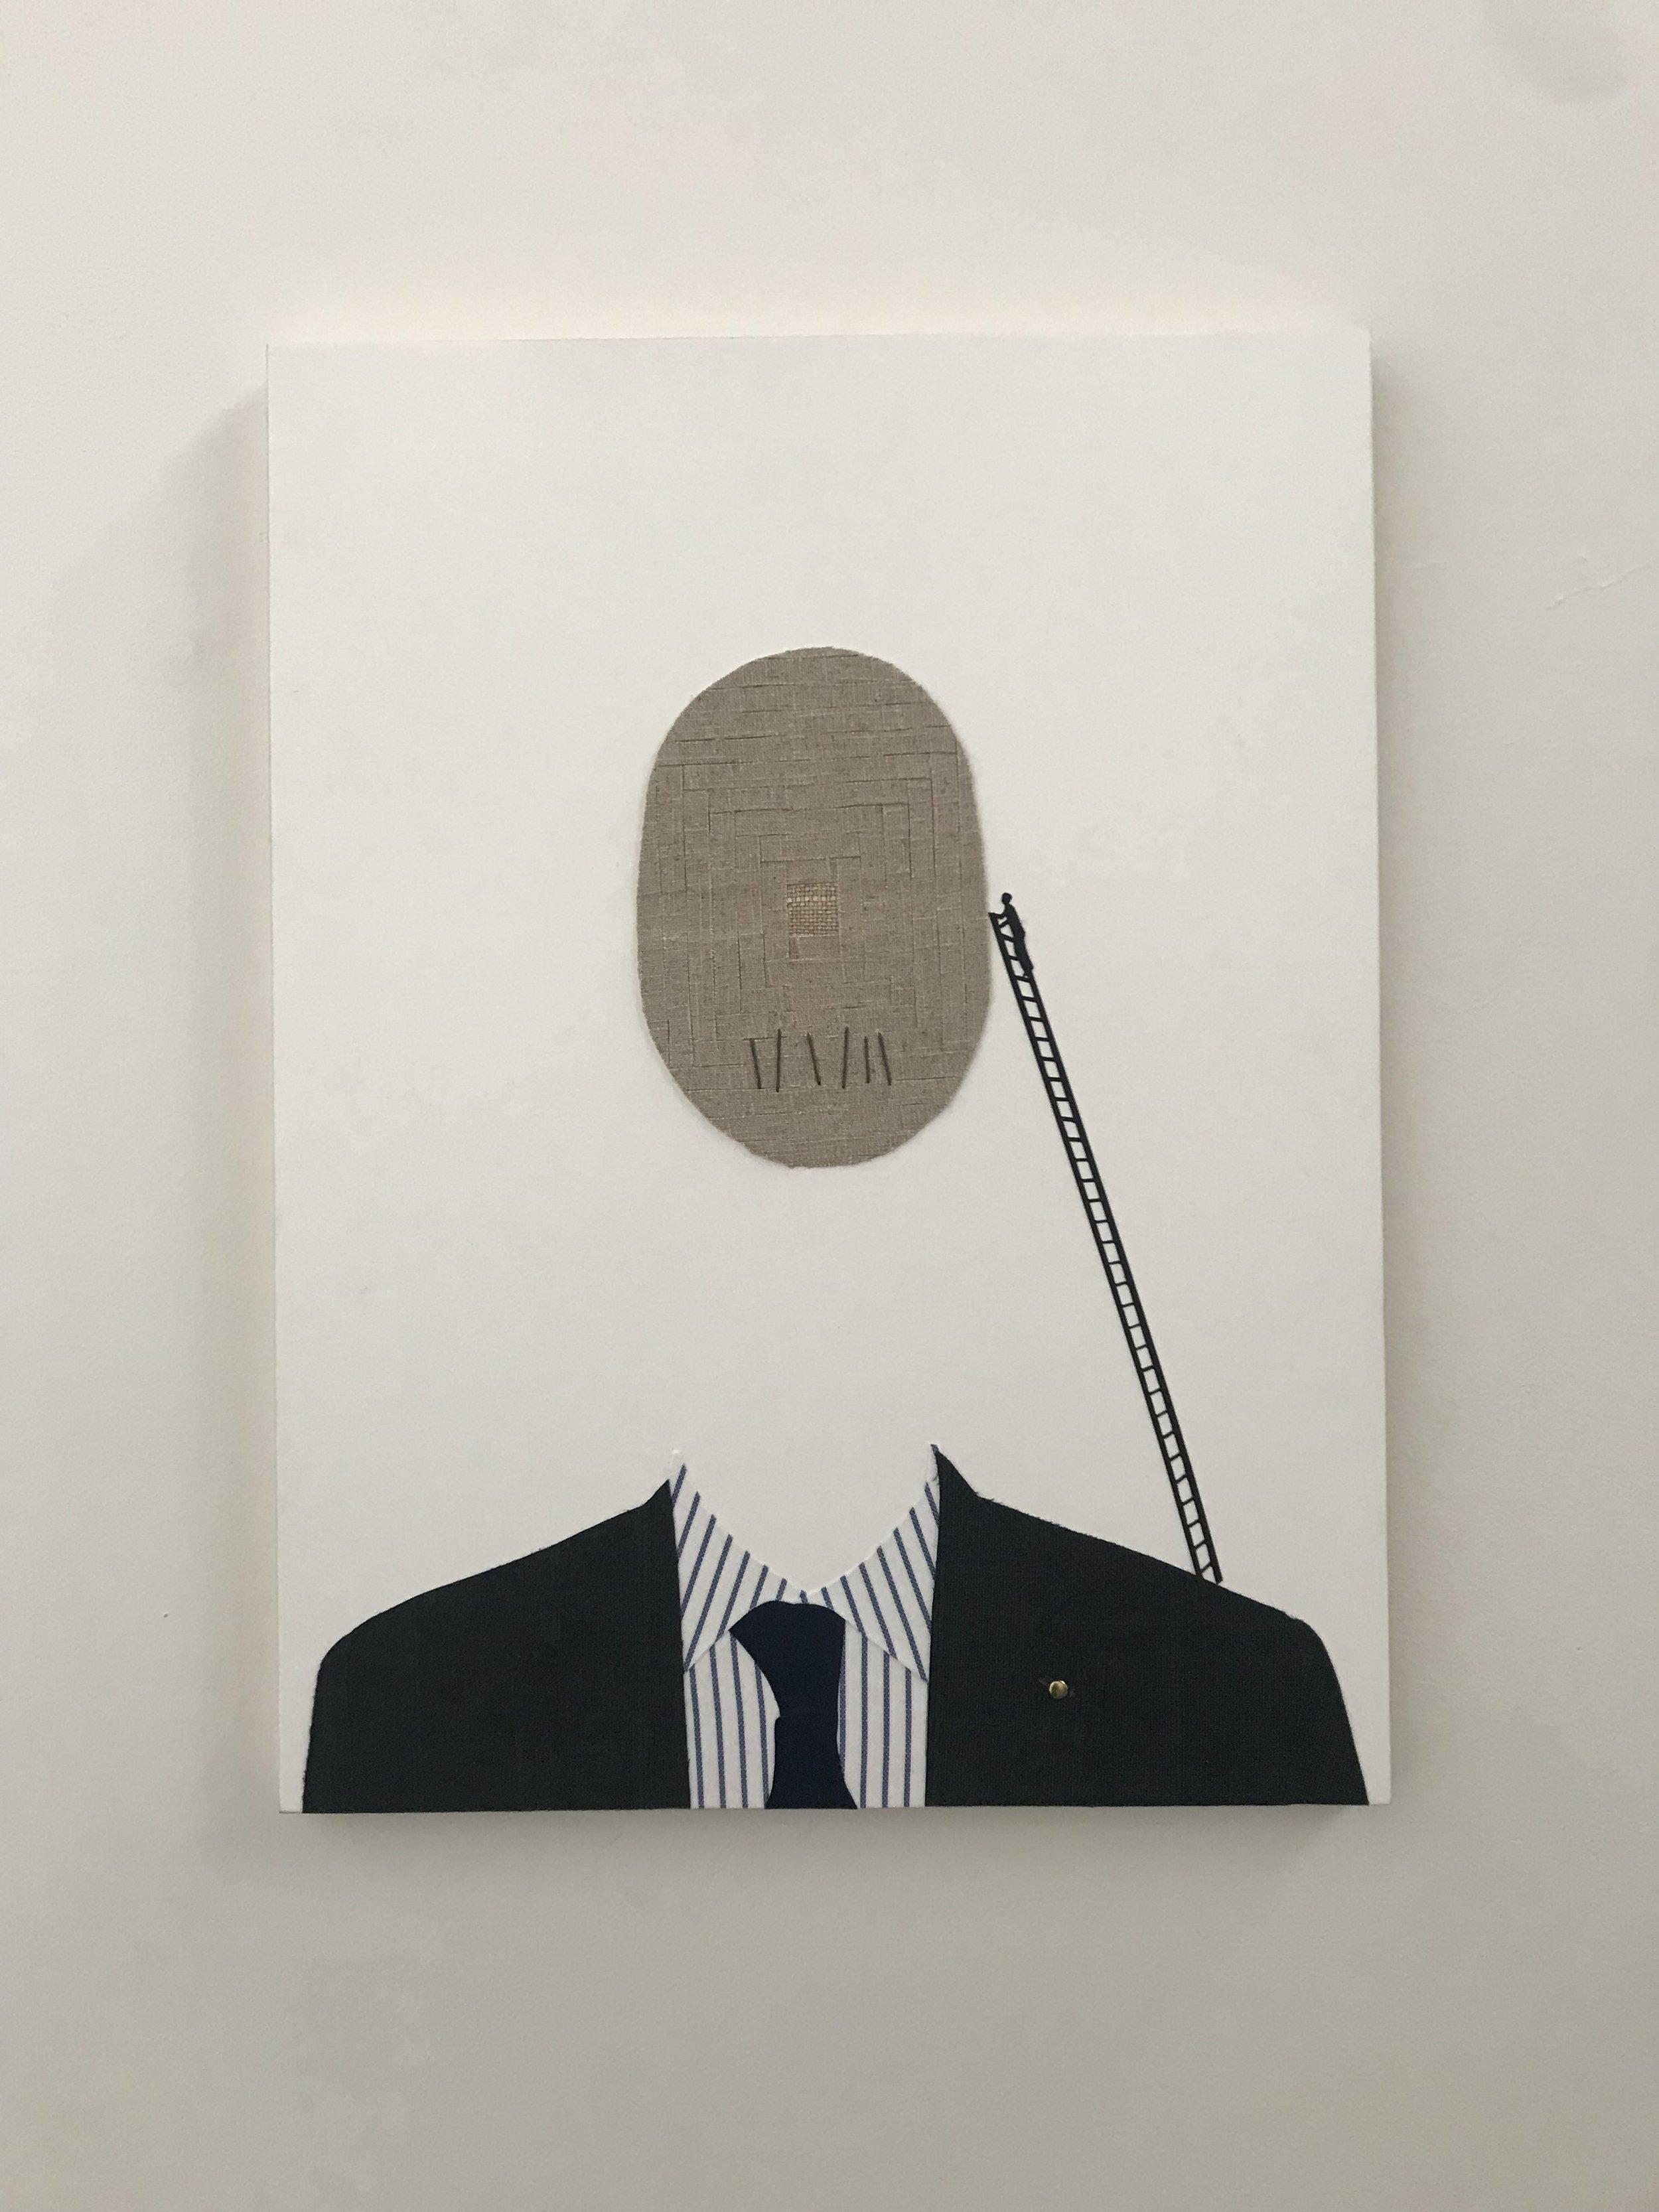 Member artwork 'The Endless Climb', Nicole Bilinski, 2019 for group exhibition 'Beg. Borrow. Steal.'